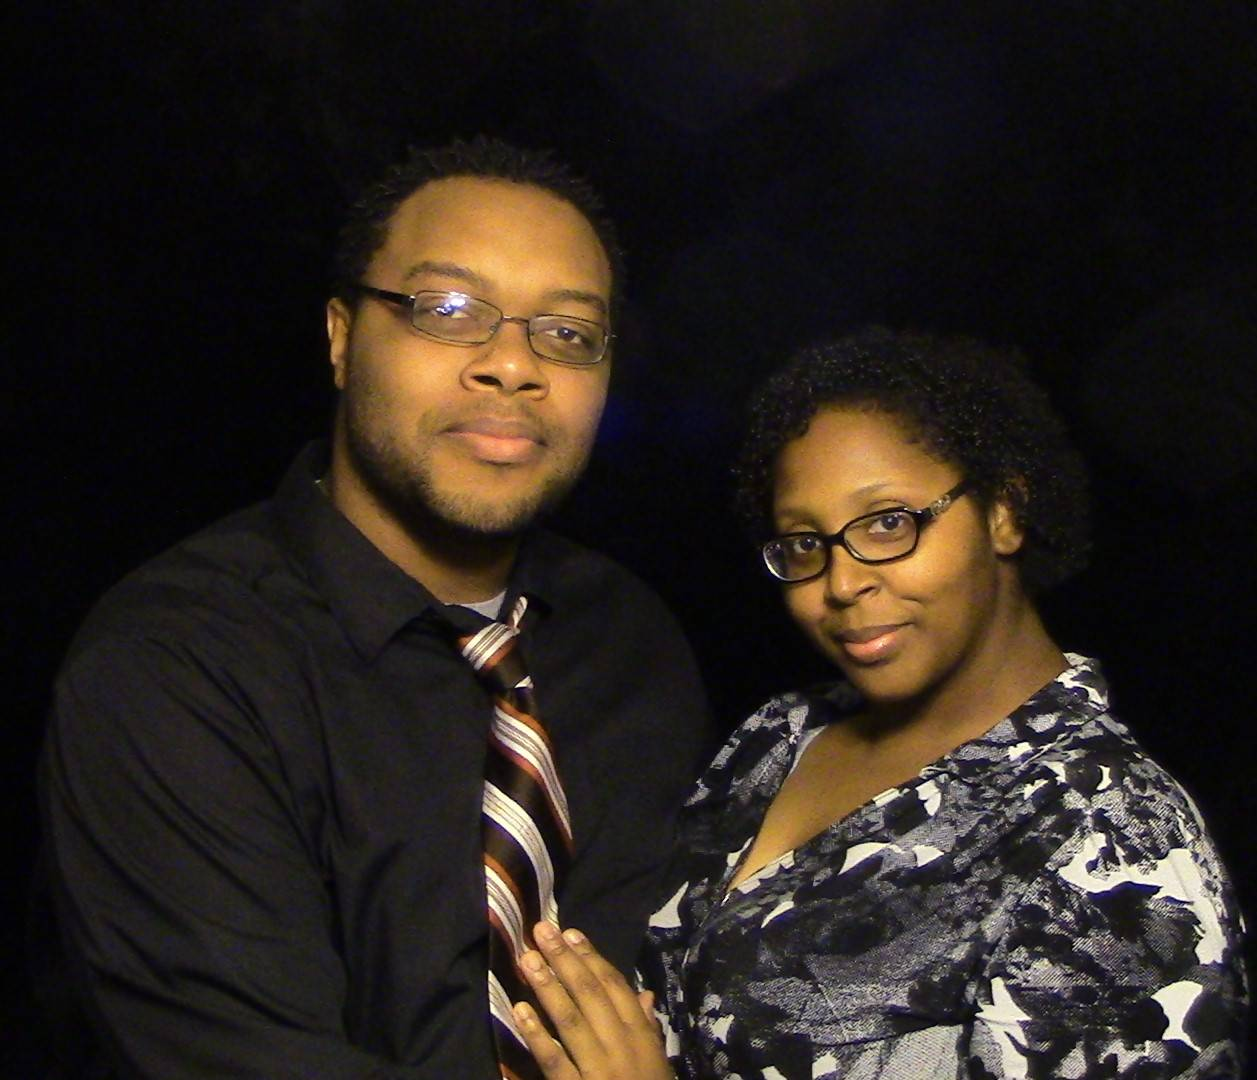 Brandon and Clemencia (Smith) Wilson